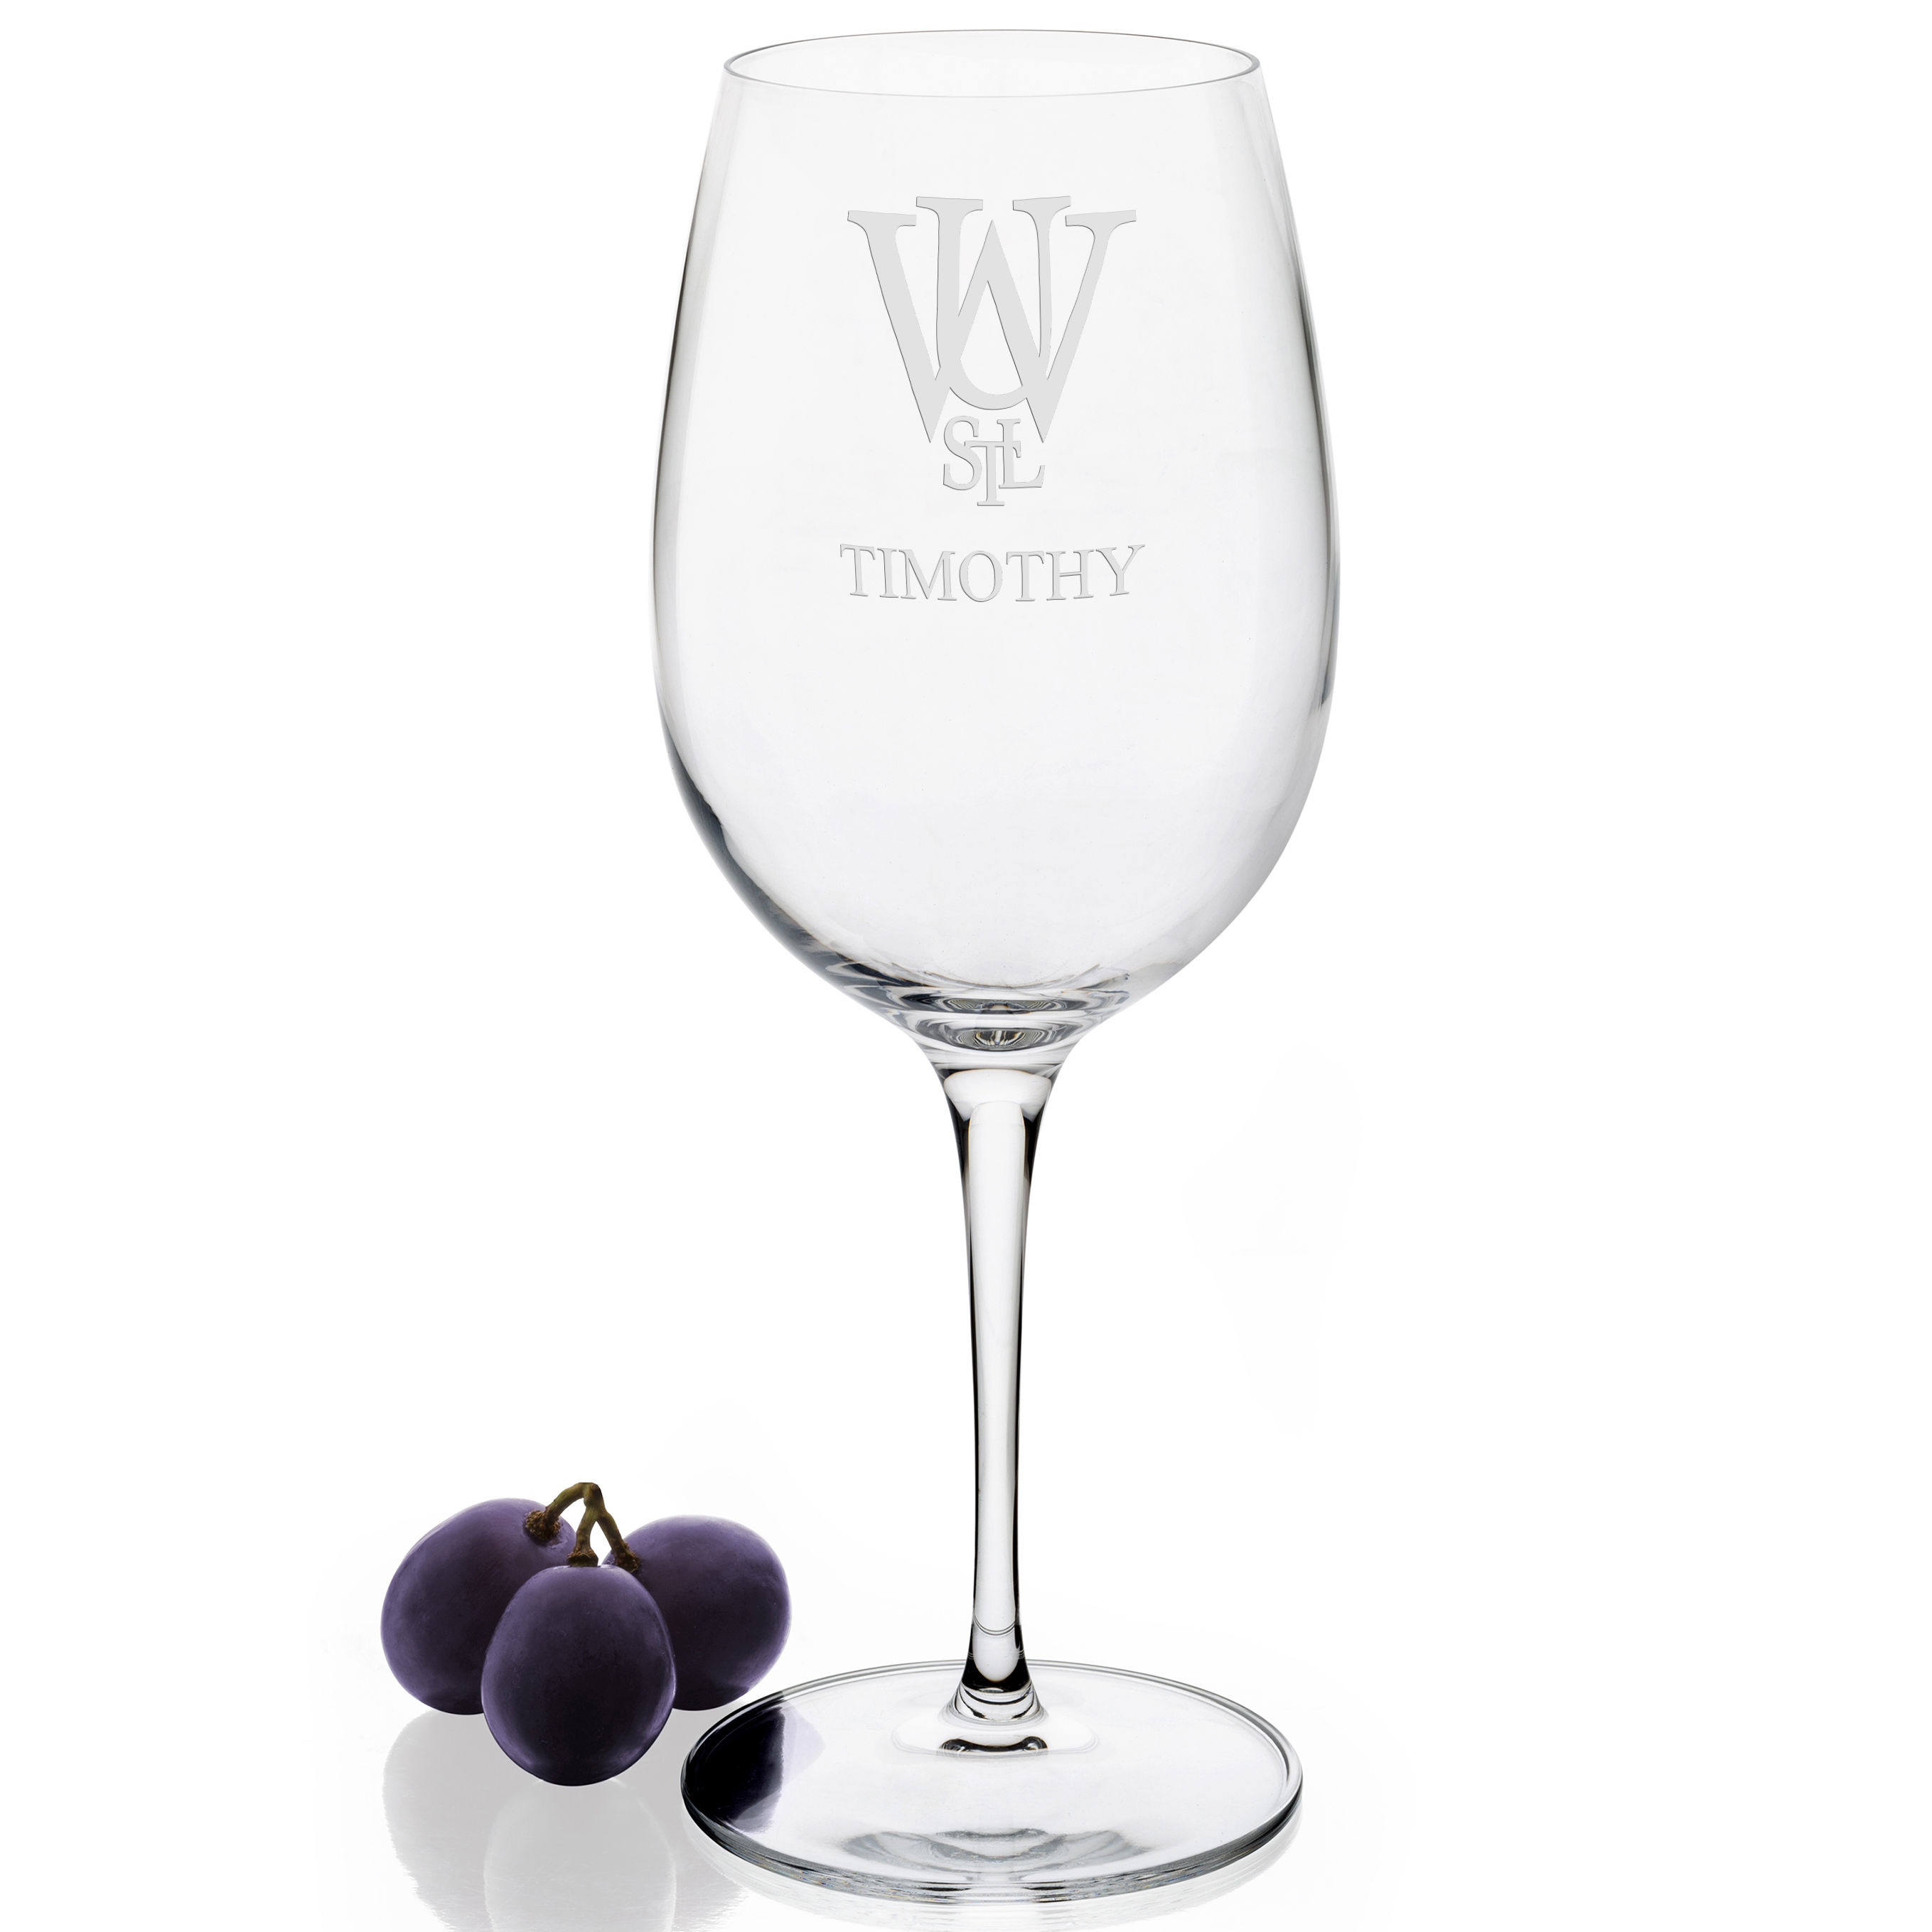 WUSTL Red Wine Glasses - Set of 4 - Image 2